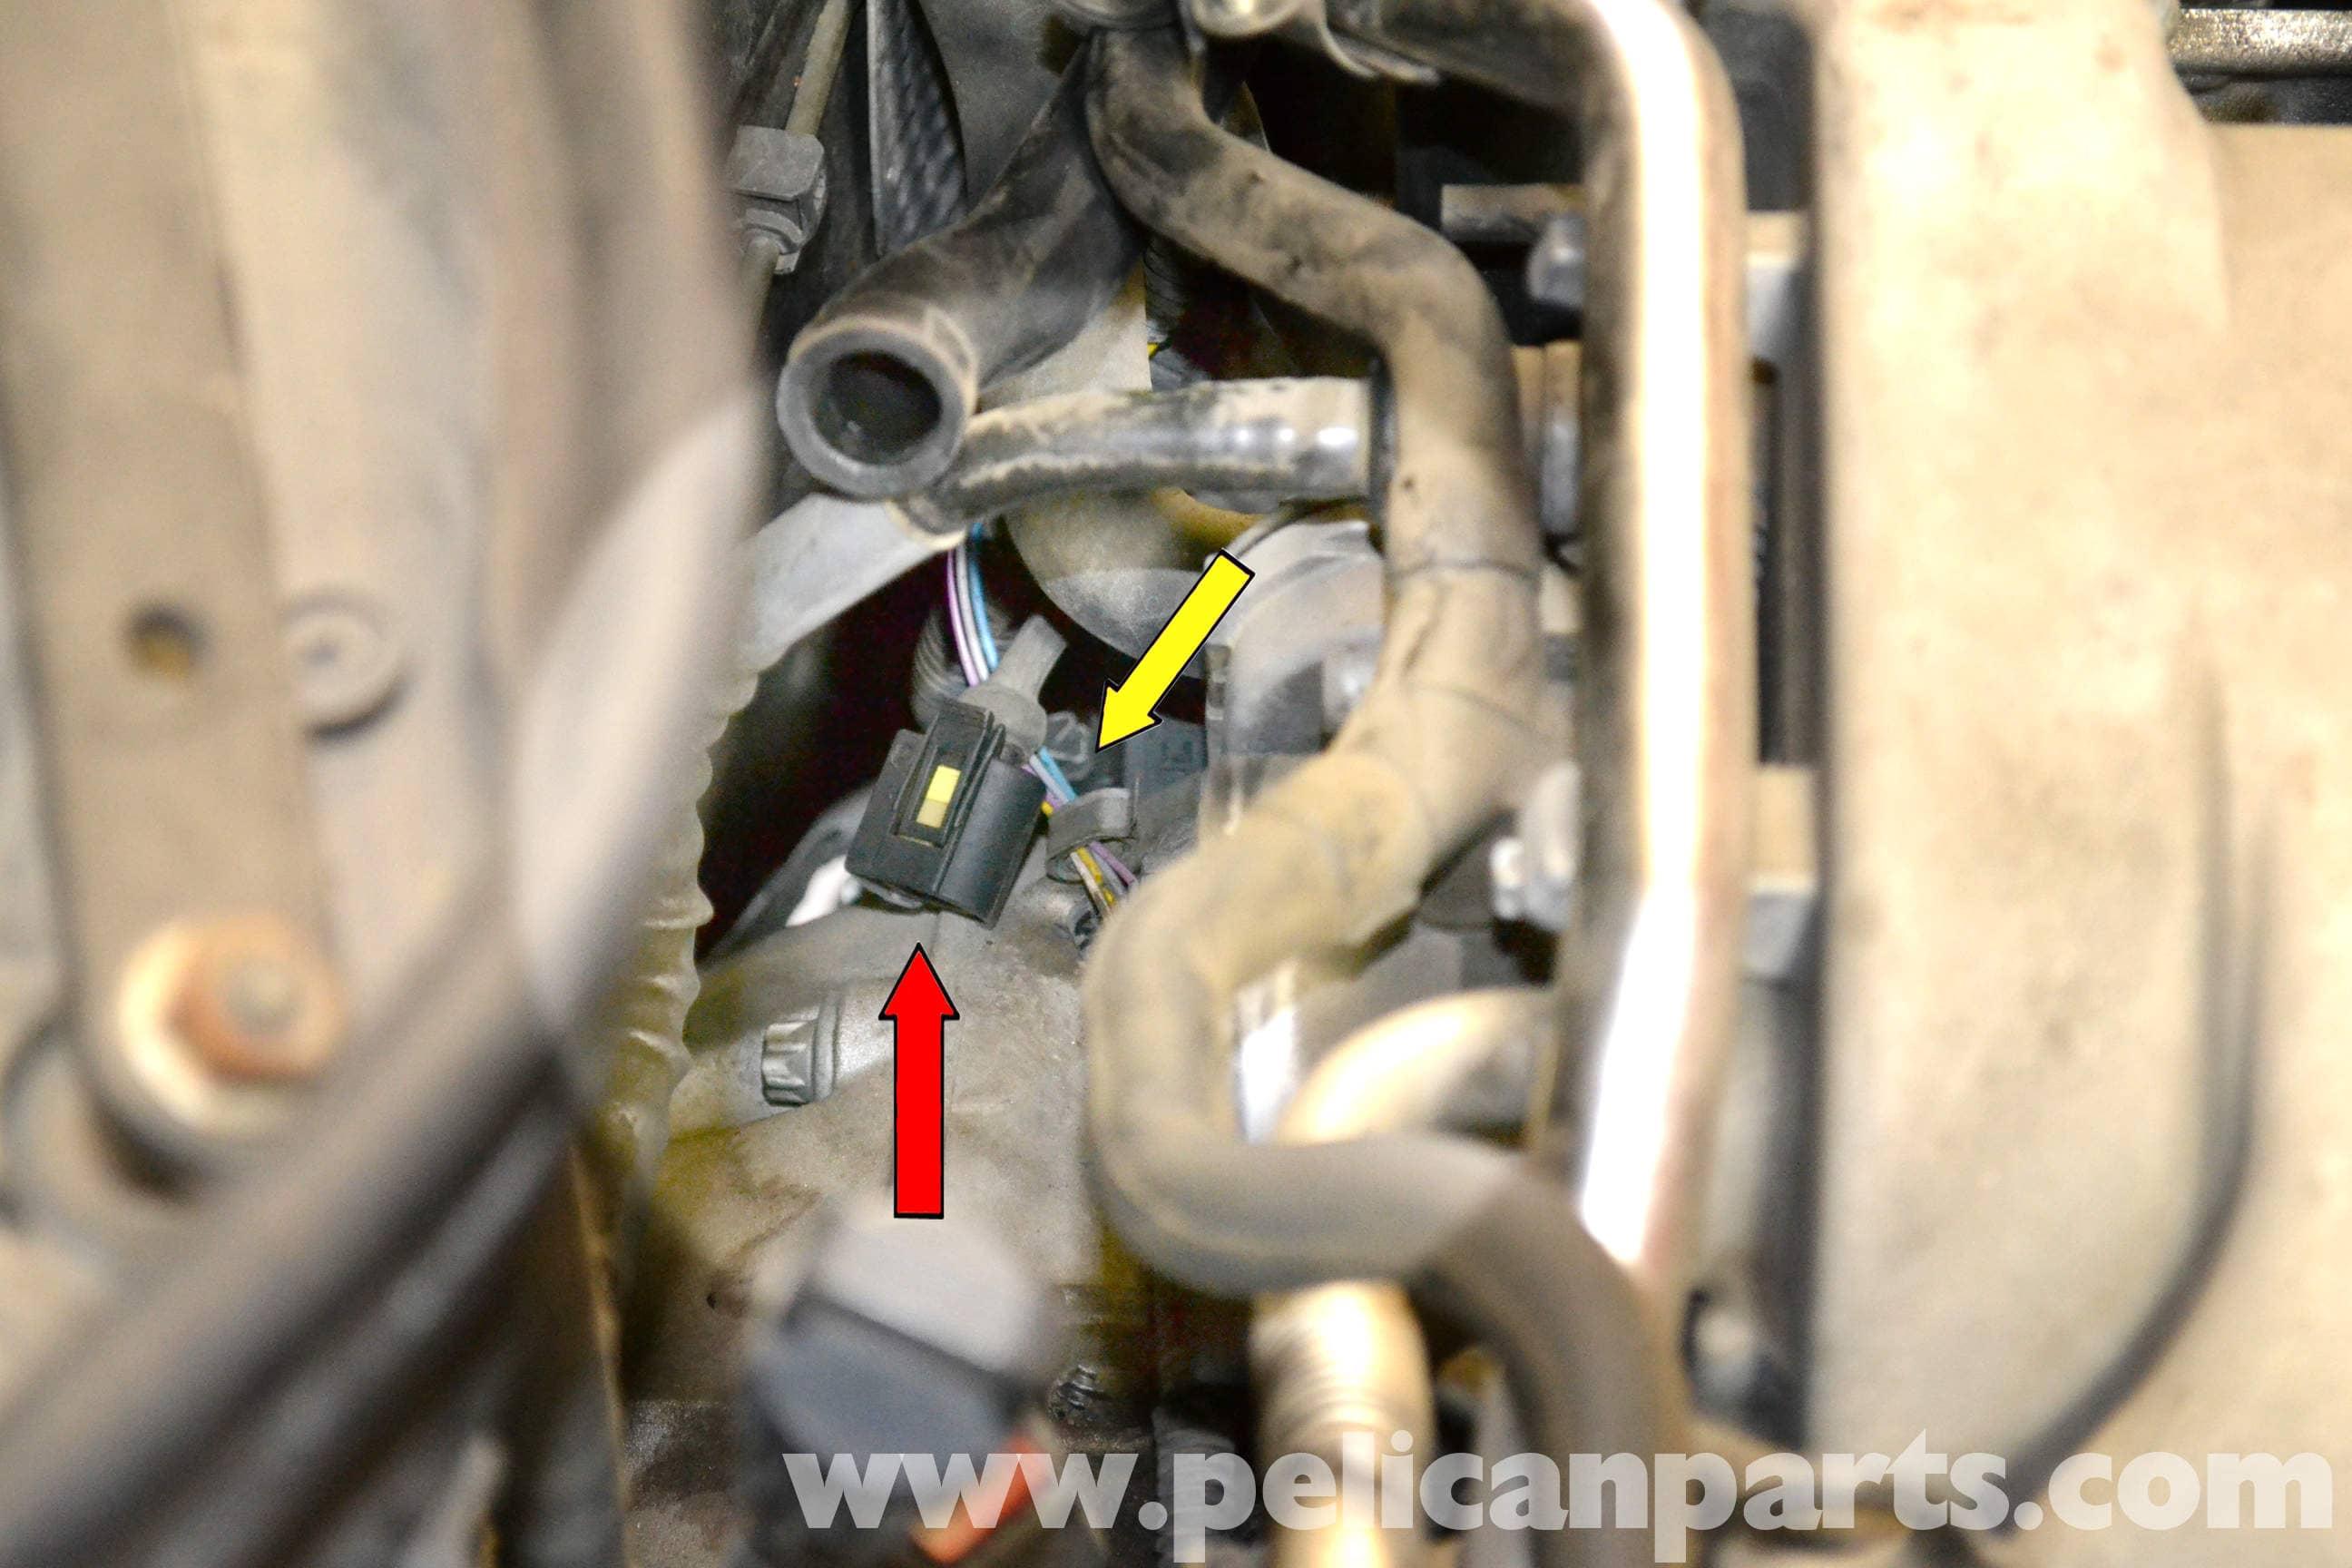 Mercedes-Benz W203 Crankshaft Positioning Sensor Replacement